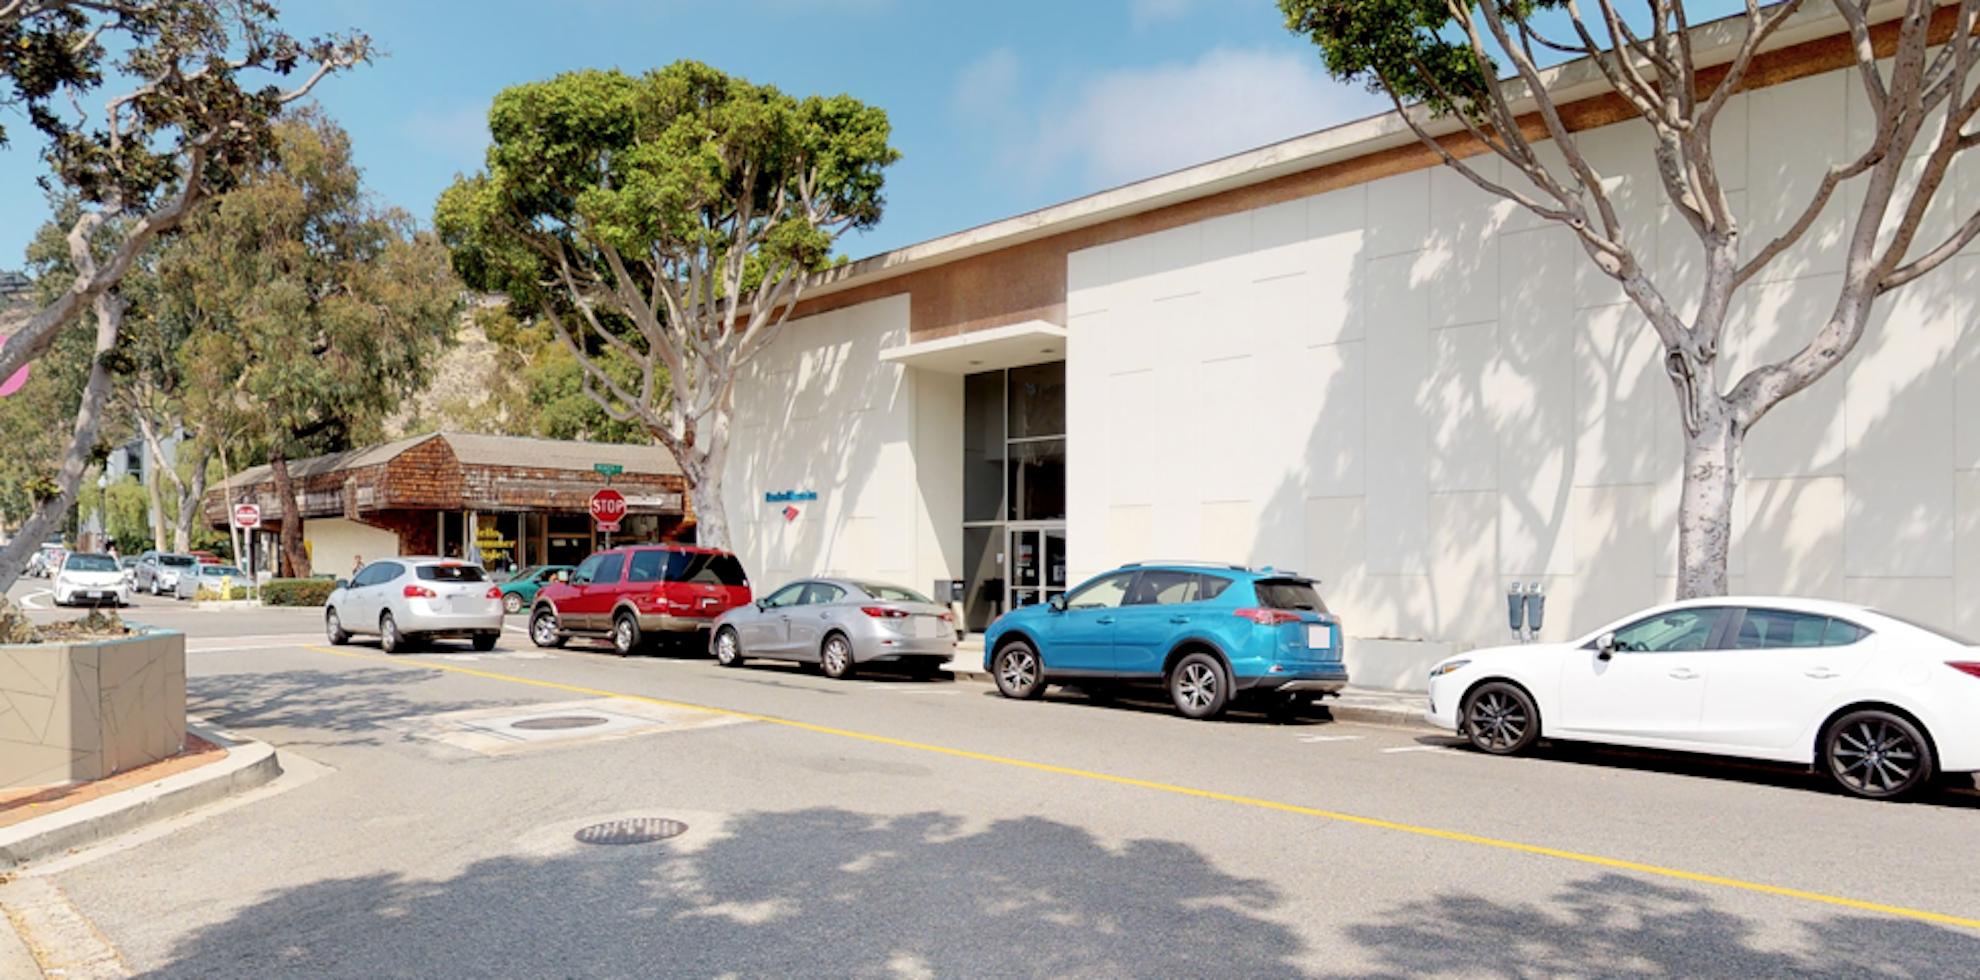 Bank of America financial center with walk-up ATM   299 Ocean Ave, Laguna Beach, CA 92651